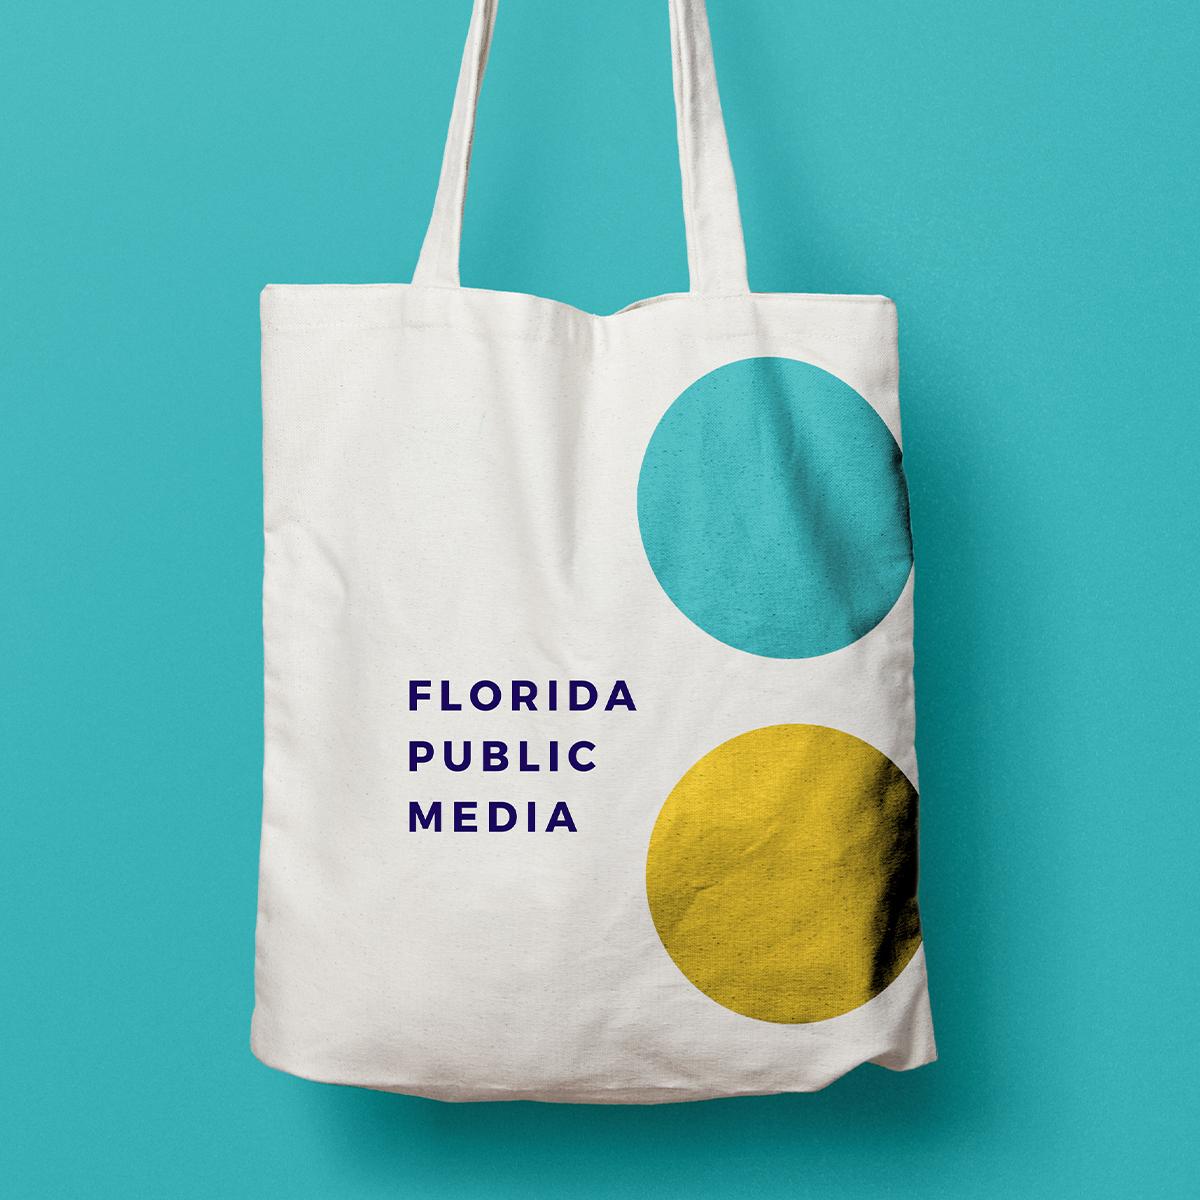 Florida Public Media_Tote